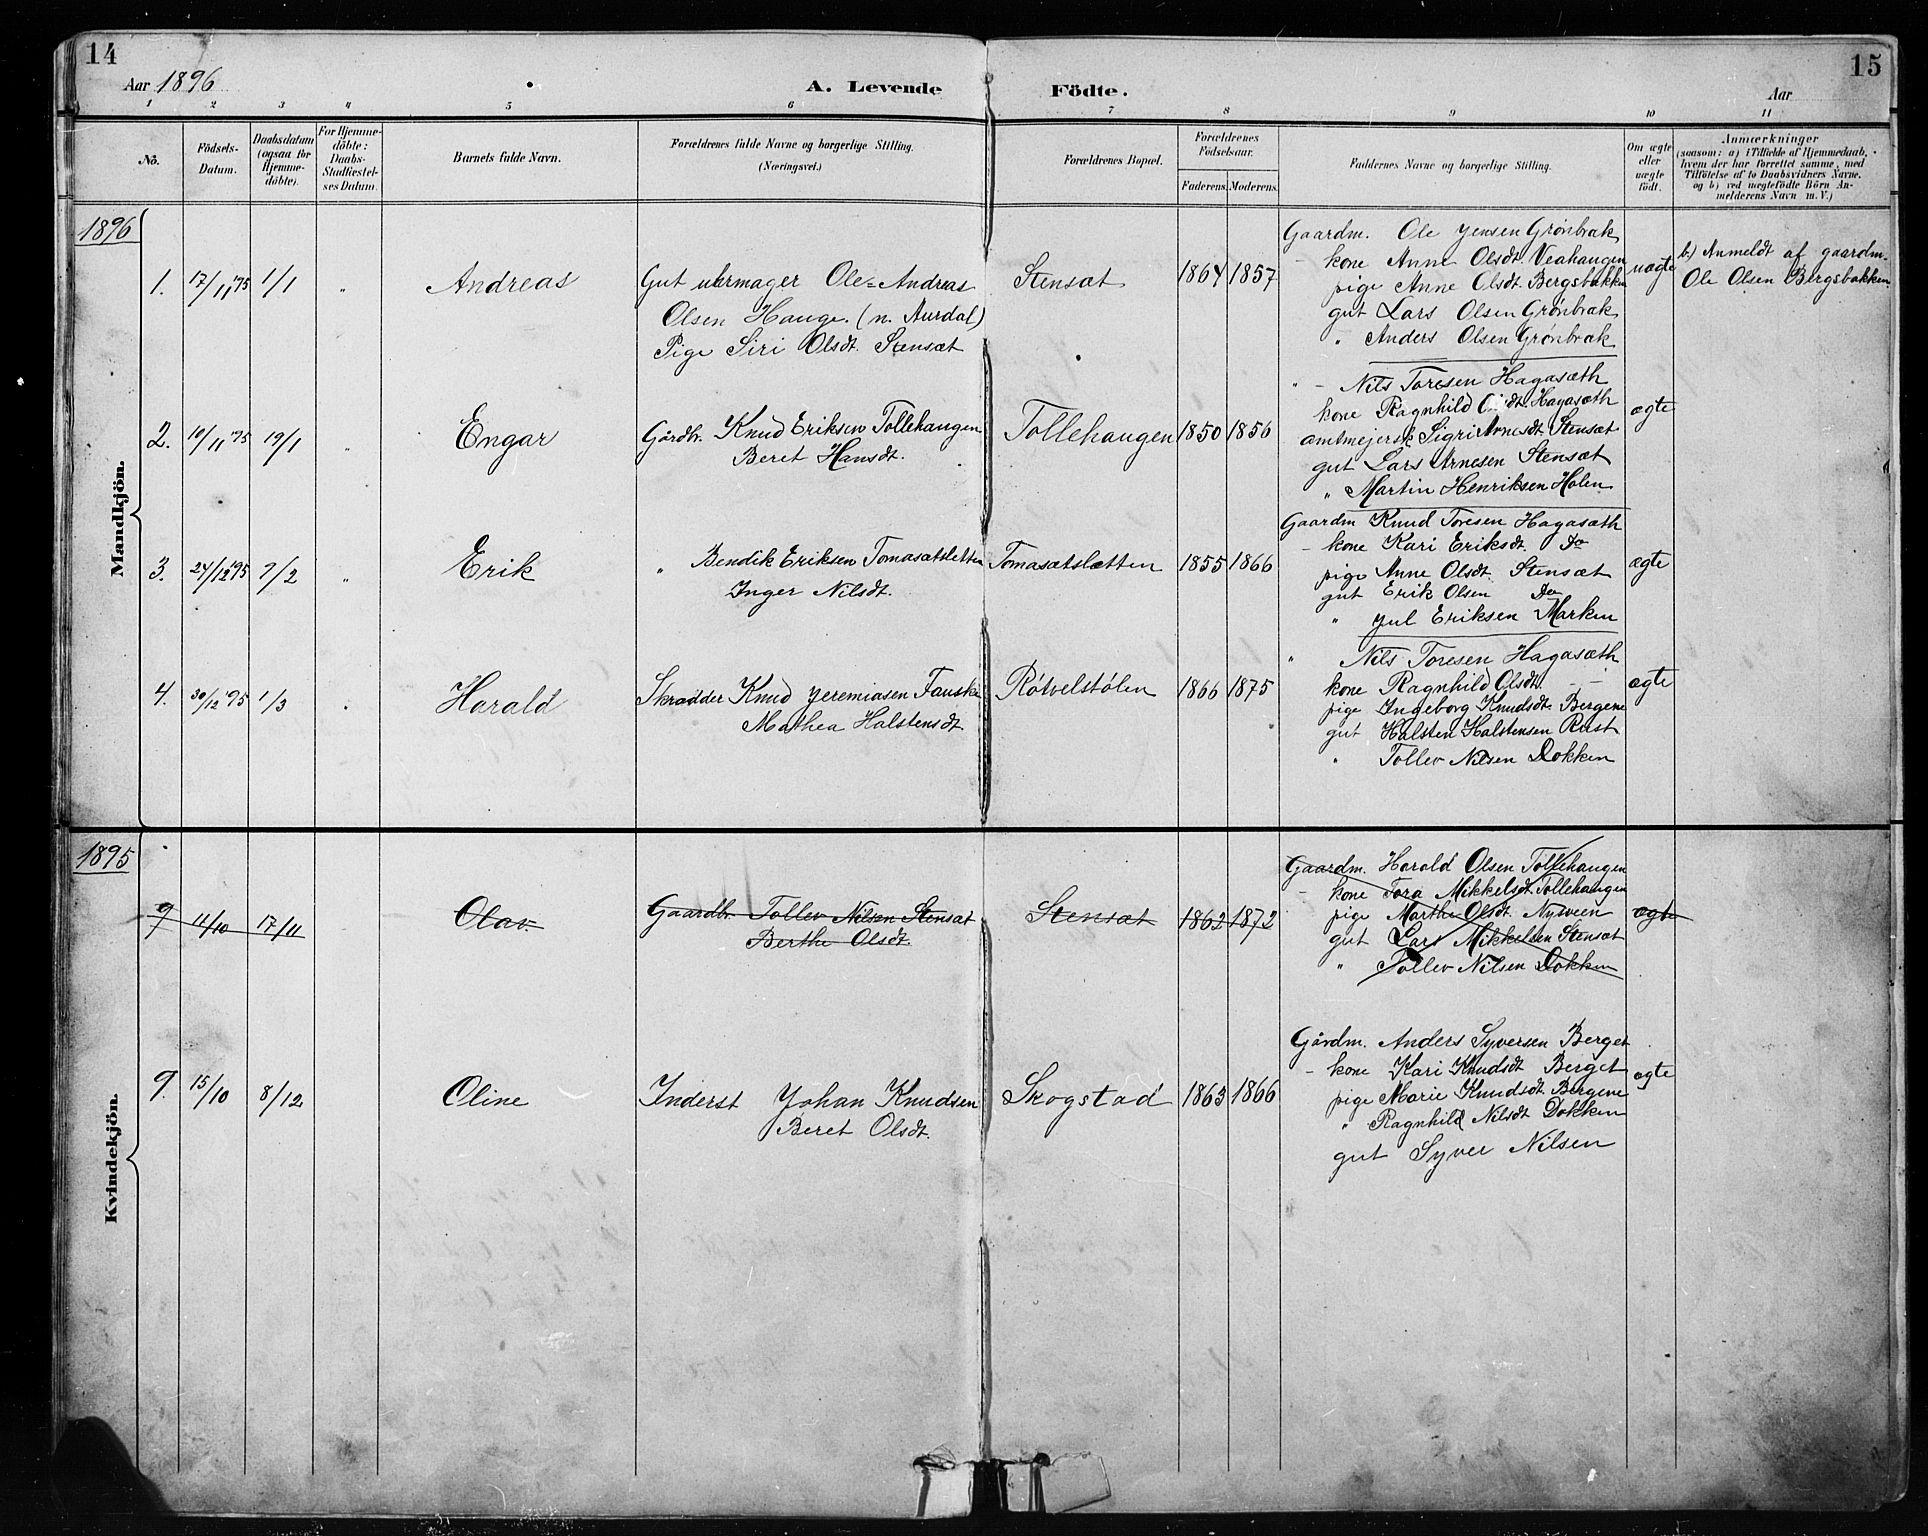 SAH, Etnedal prestekontor, H/Ha/Hab/Habb/L0001: Klokkerbok nr. II 1, 1894-1911, s. 14-15